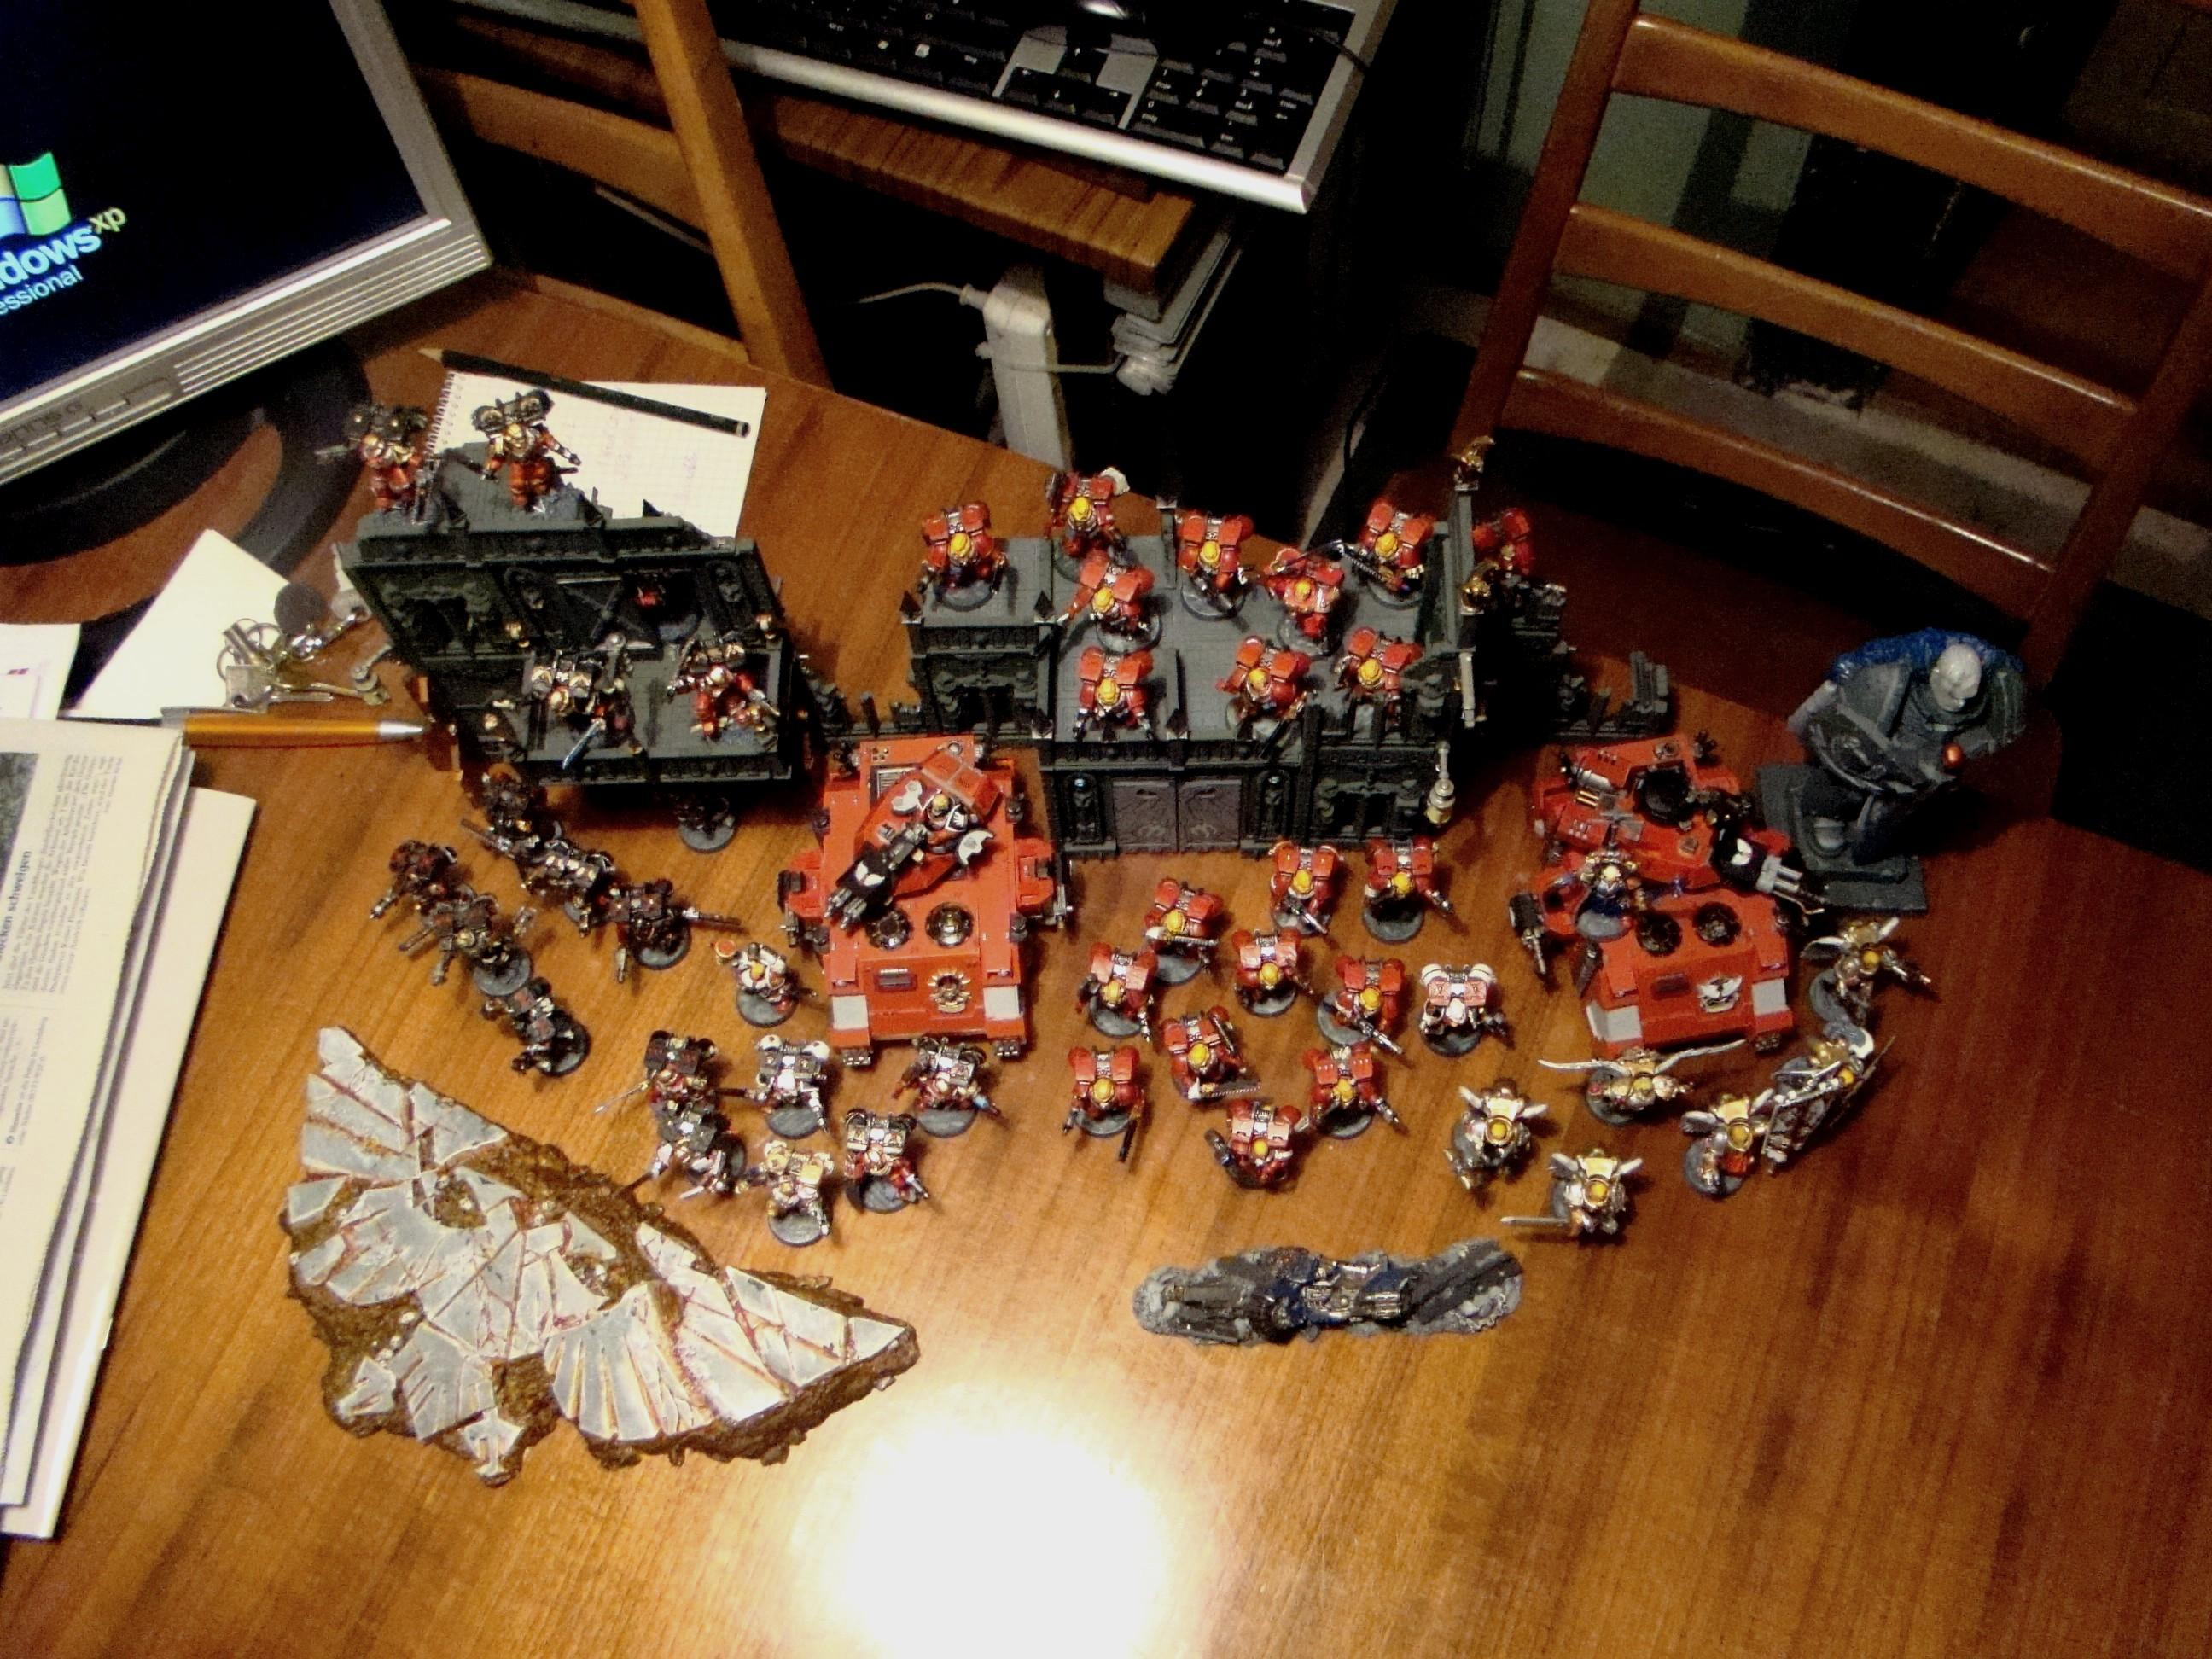 Blood Angels, Space Marines, Warhammer 40,000